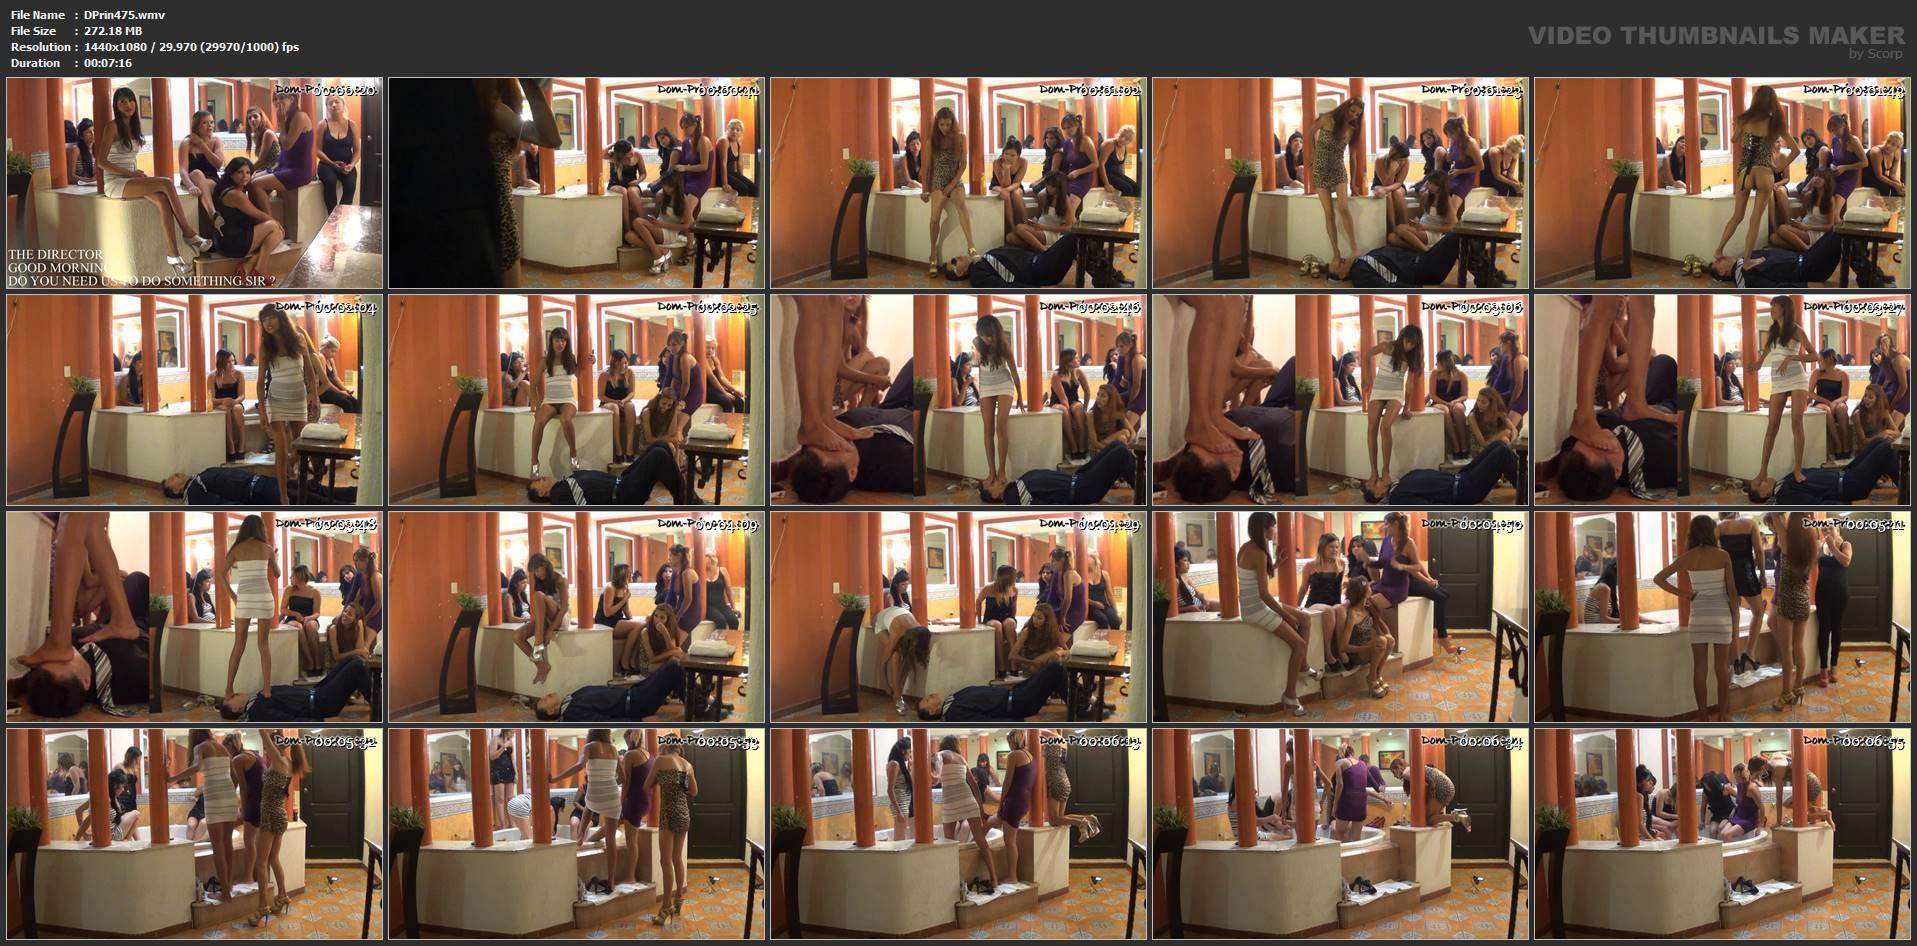 [DOM-PRINCESS] The Jacuzzi Toilet Man Part 1 Intro [FULL HD][1080p][WMV]